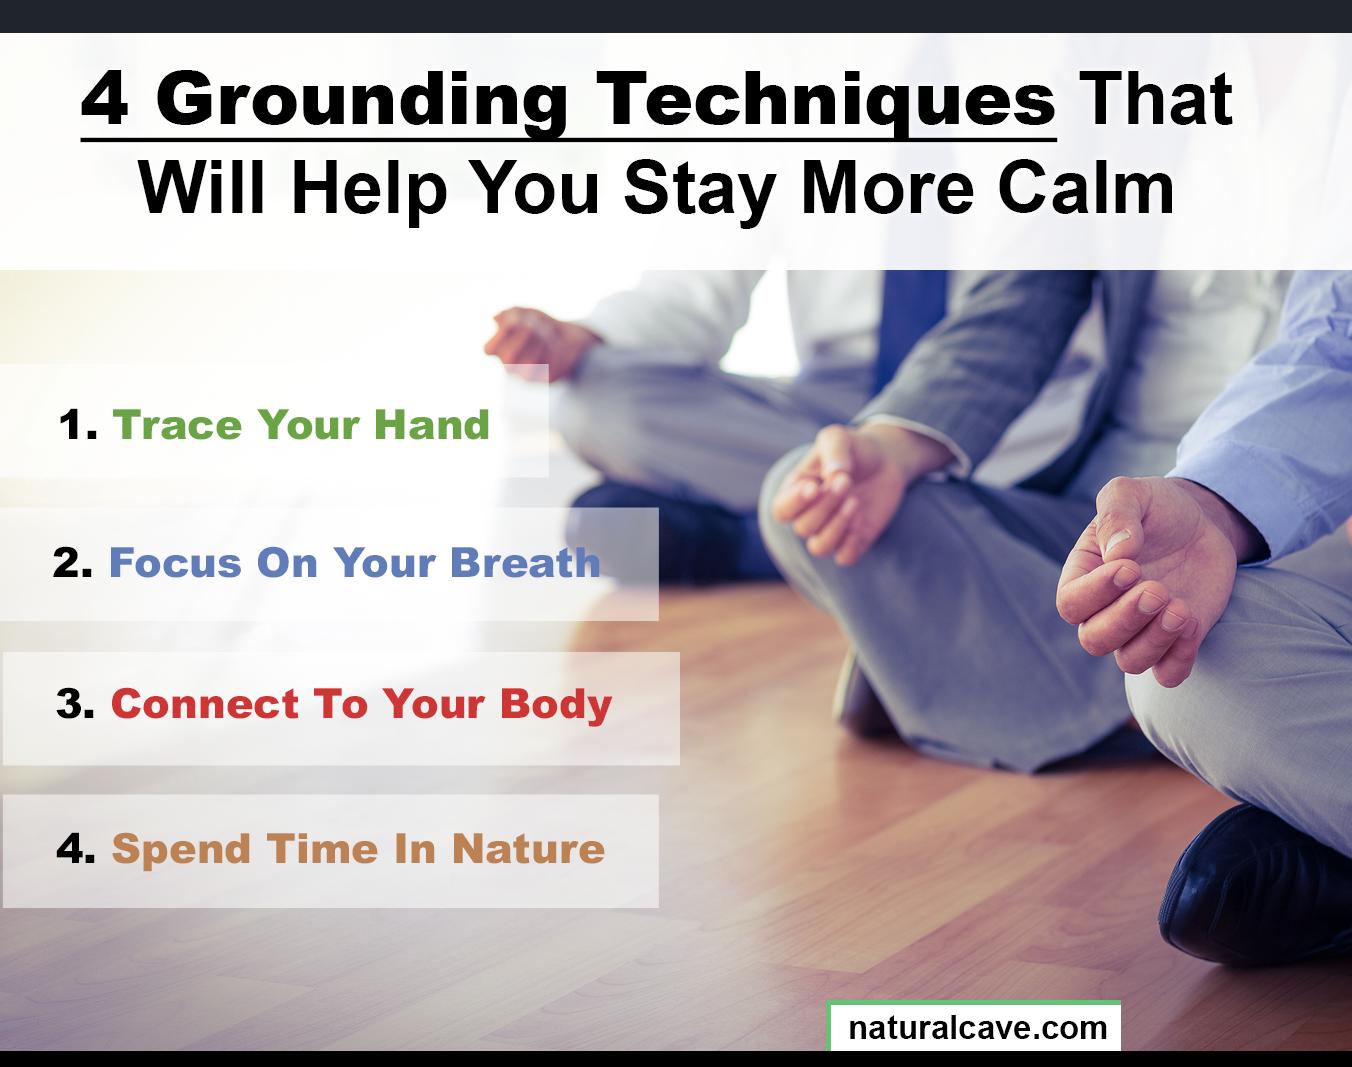 grounding techniques infographic